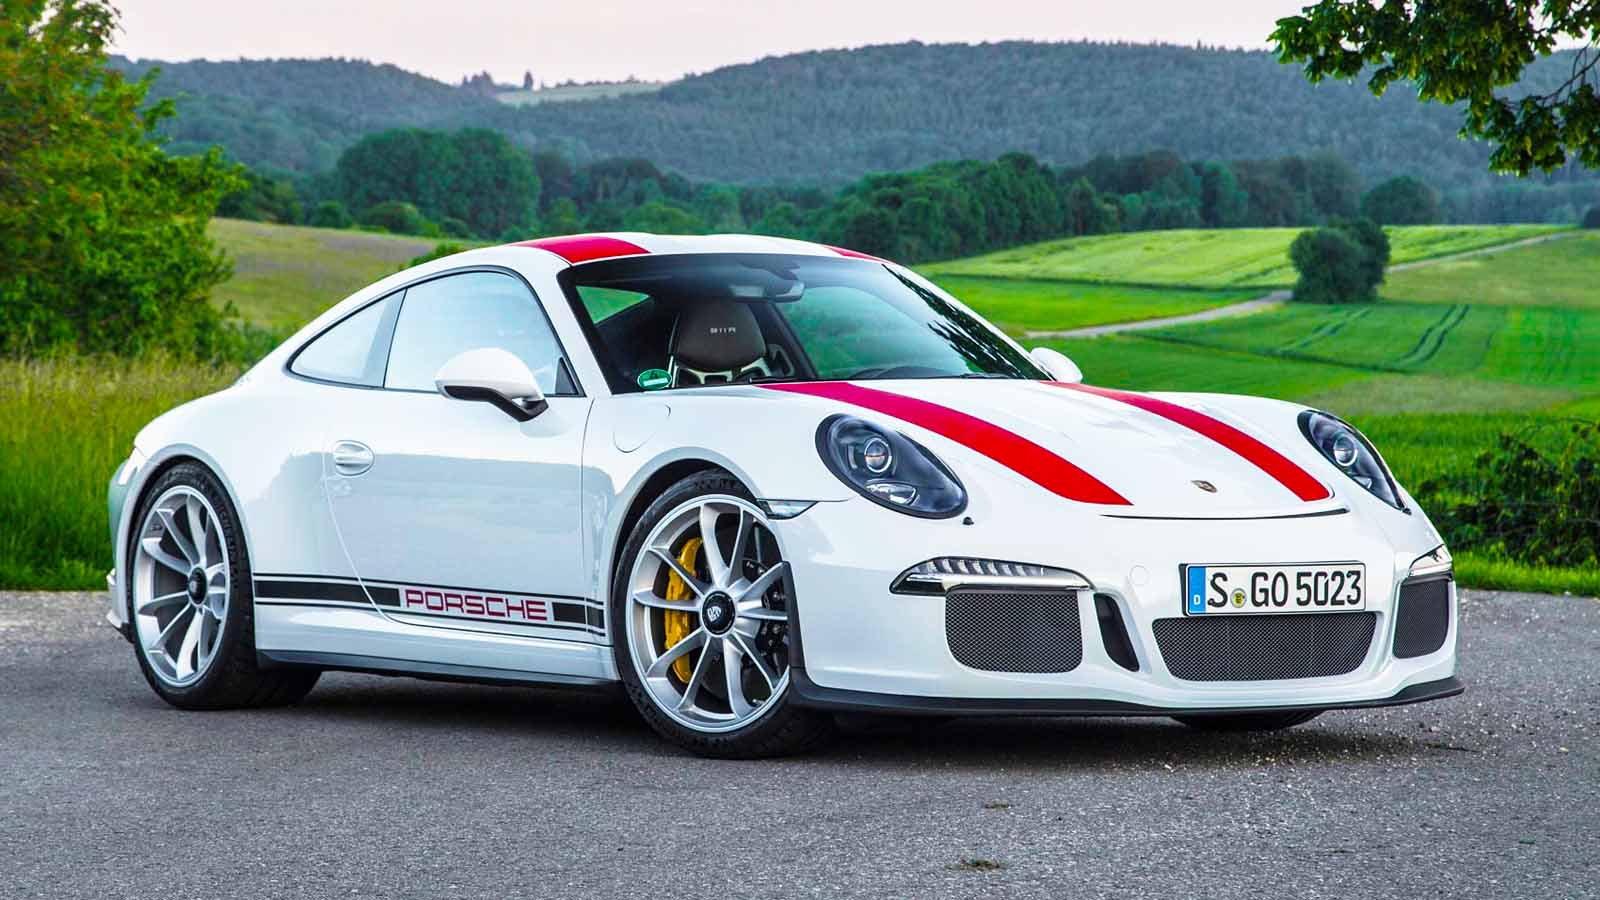 Classic or Current Porsche